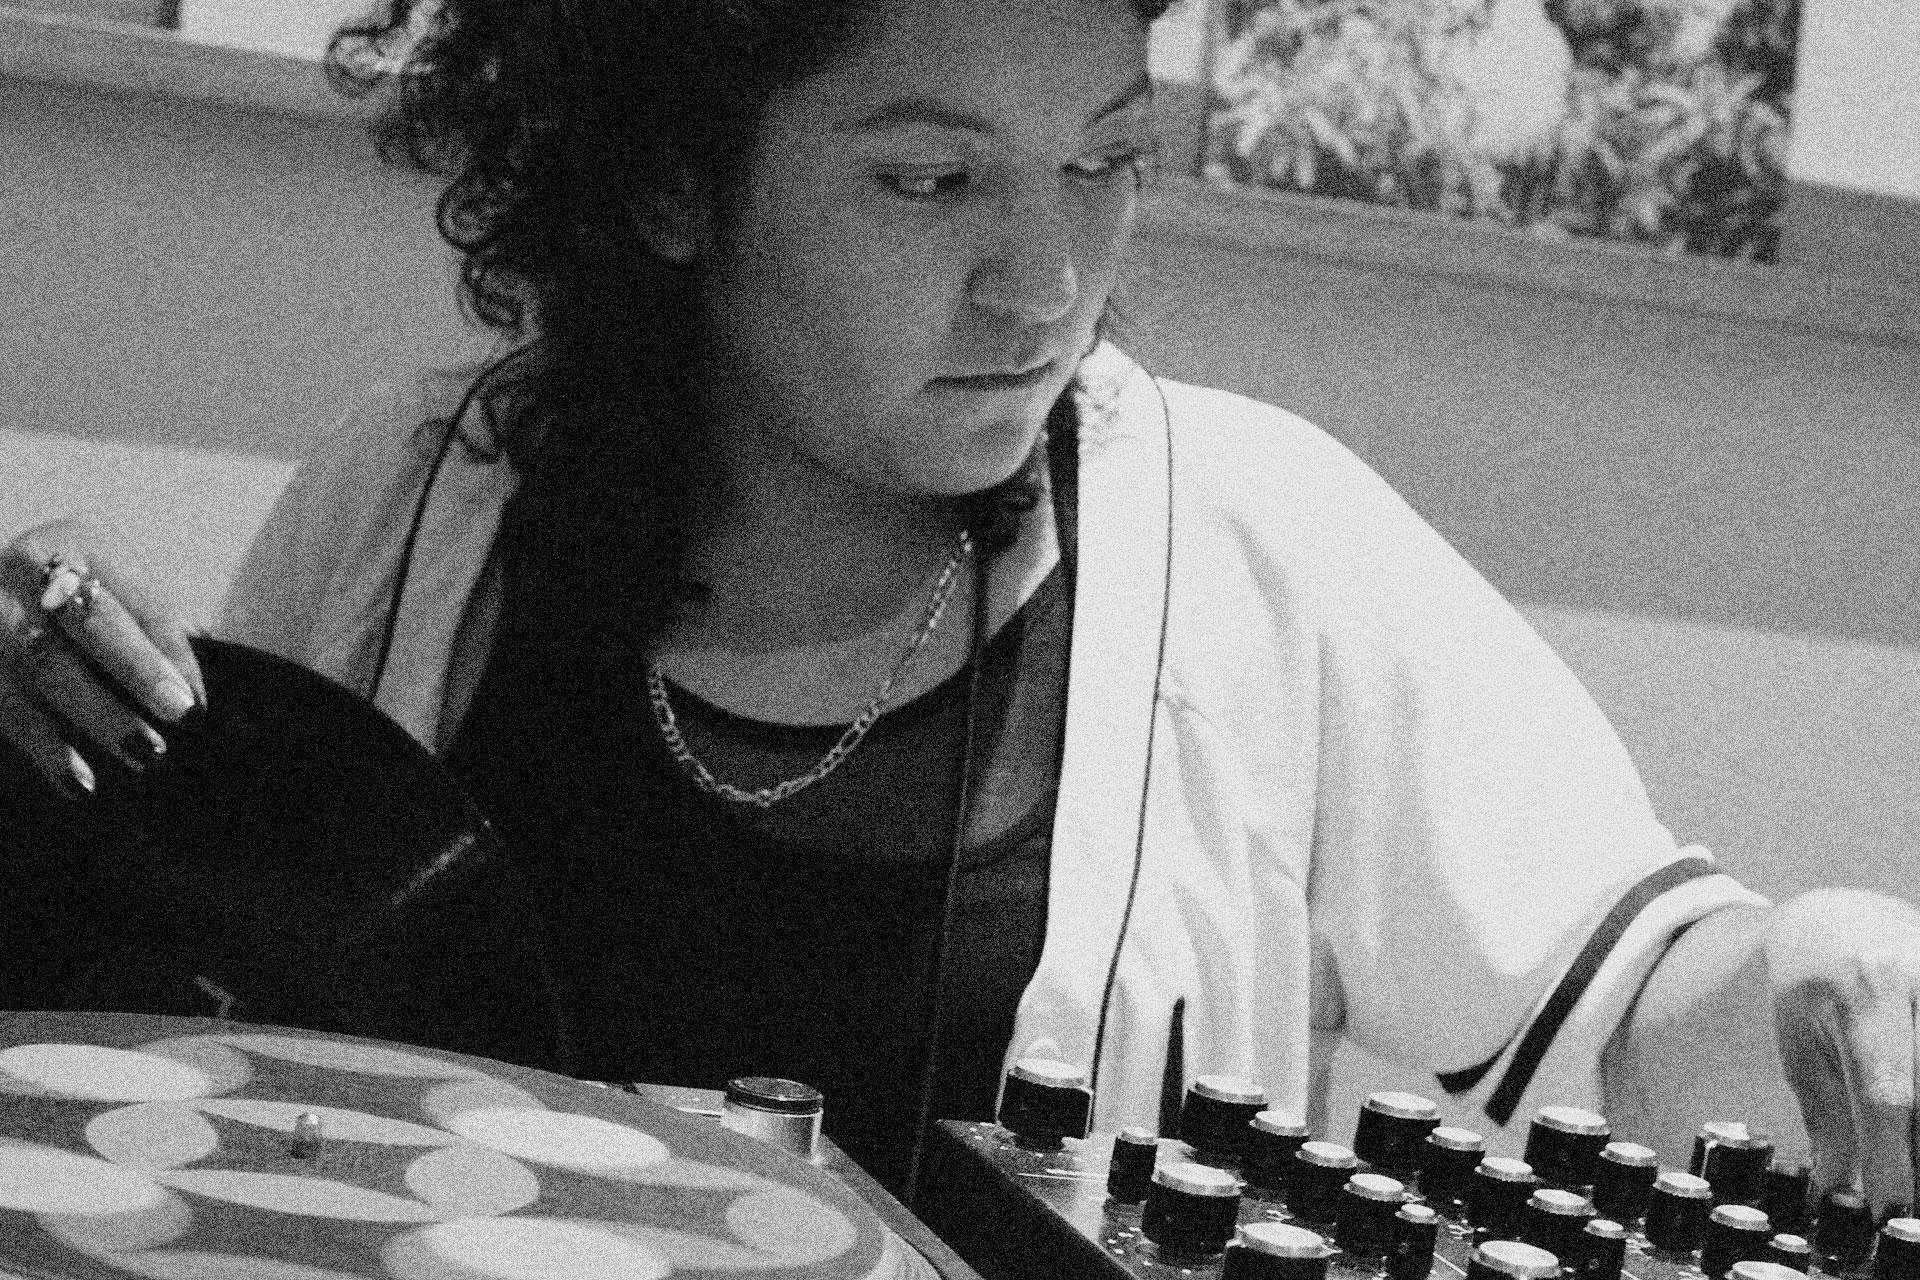 DJ-Invitada-at-Yu-Yu-Recordshop-03-MOVELIKE© gallery item